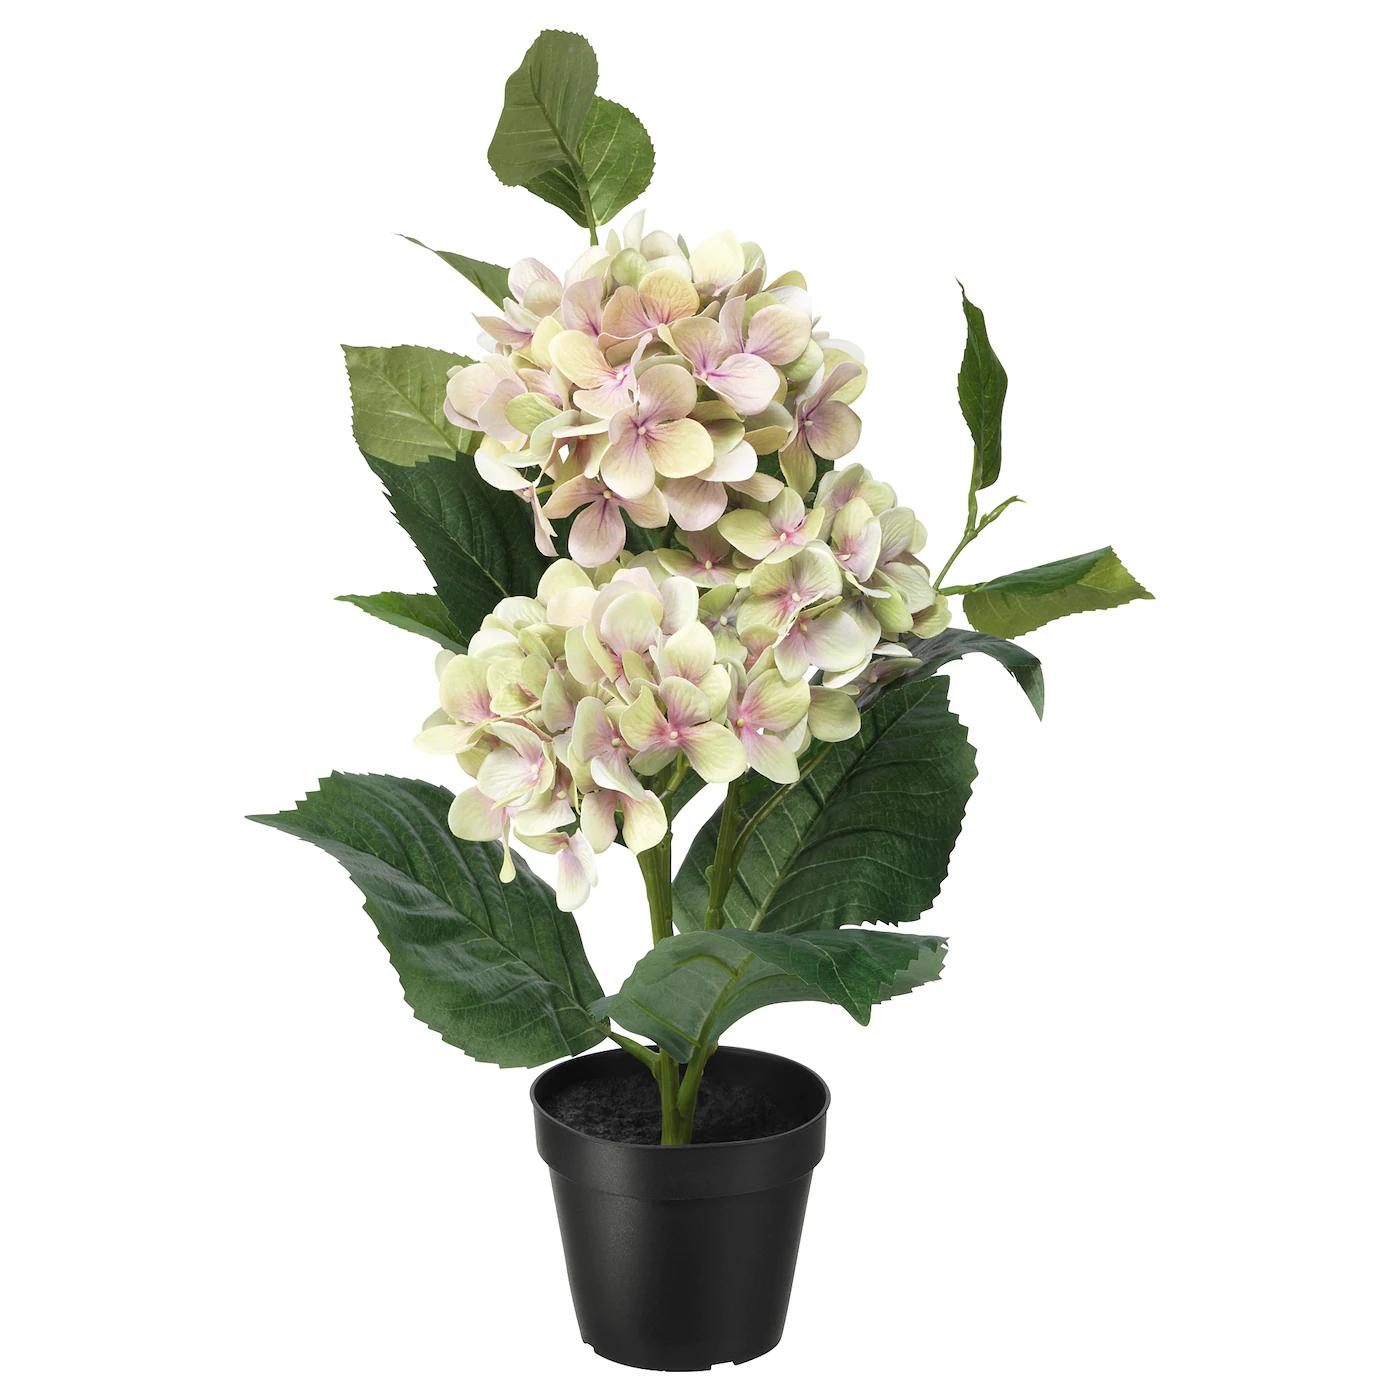 Plante artificielle Fejka - Hydrangea vert, 12 cm